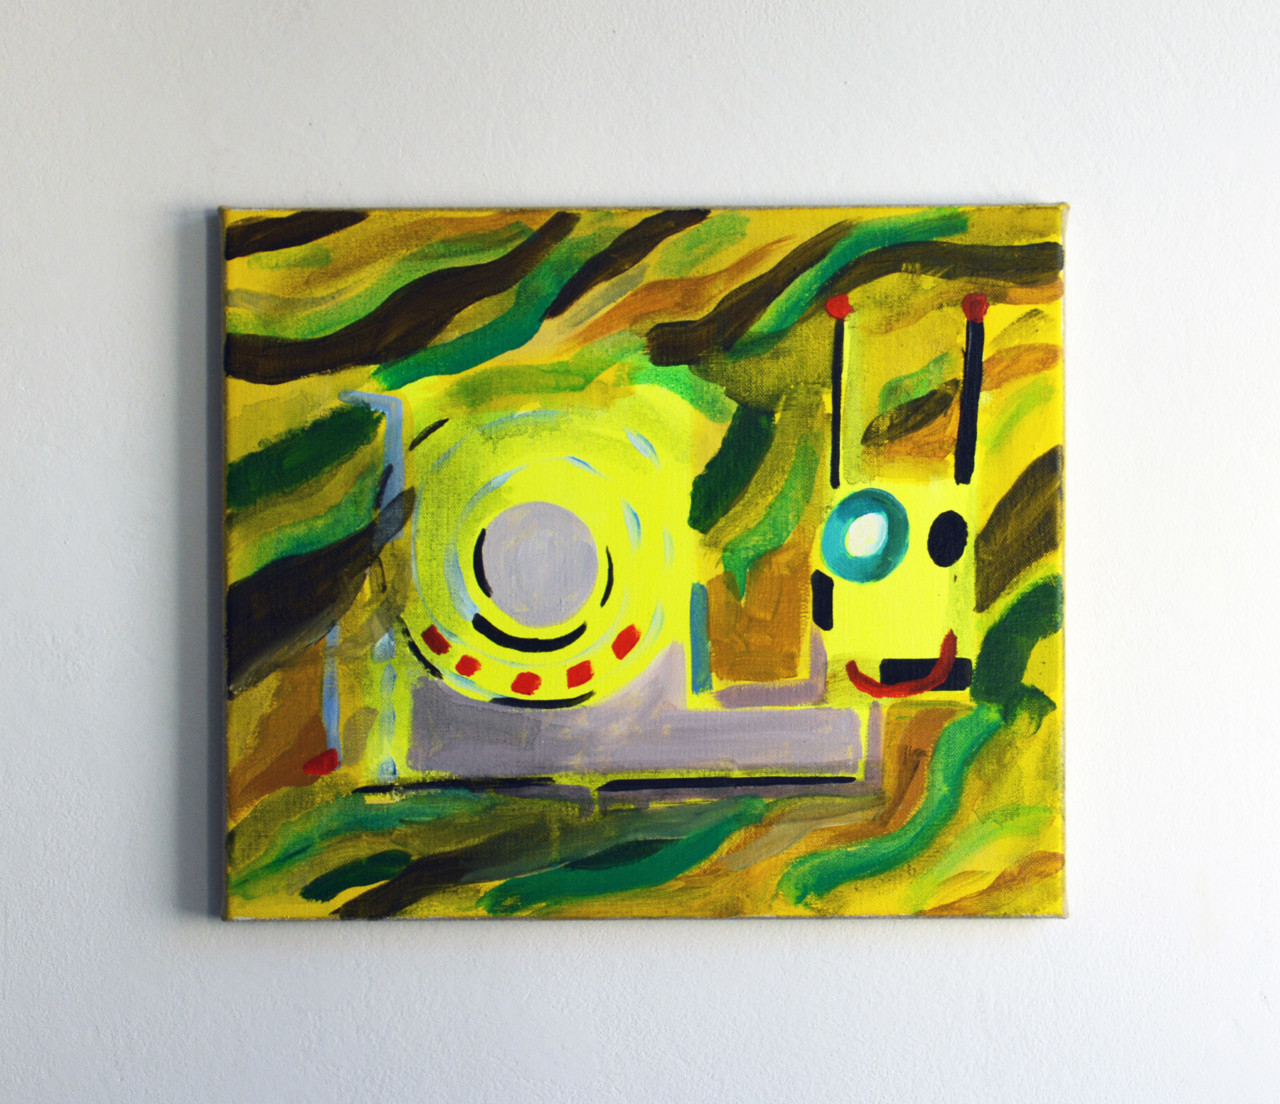 Ulrich Hakel modernism2